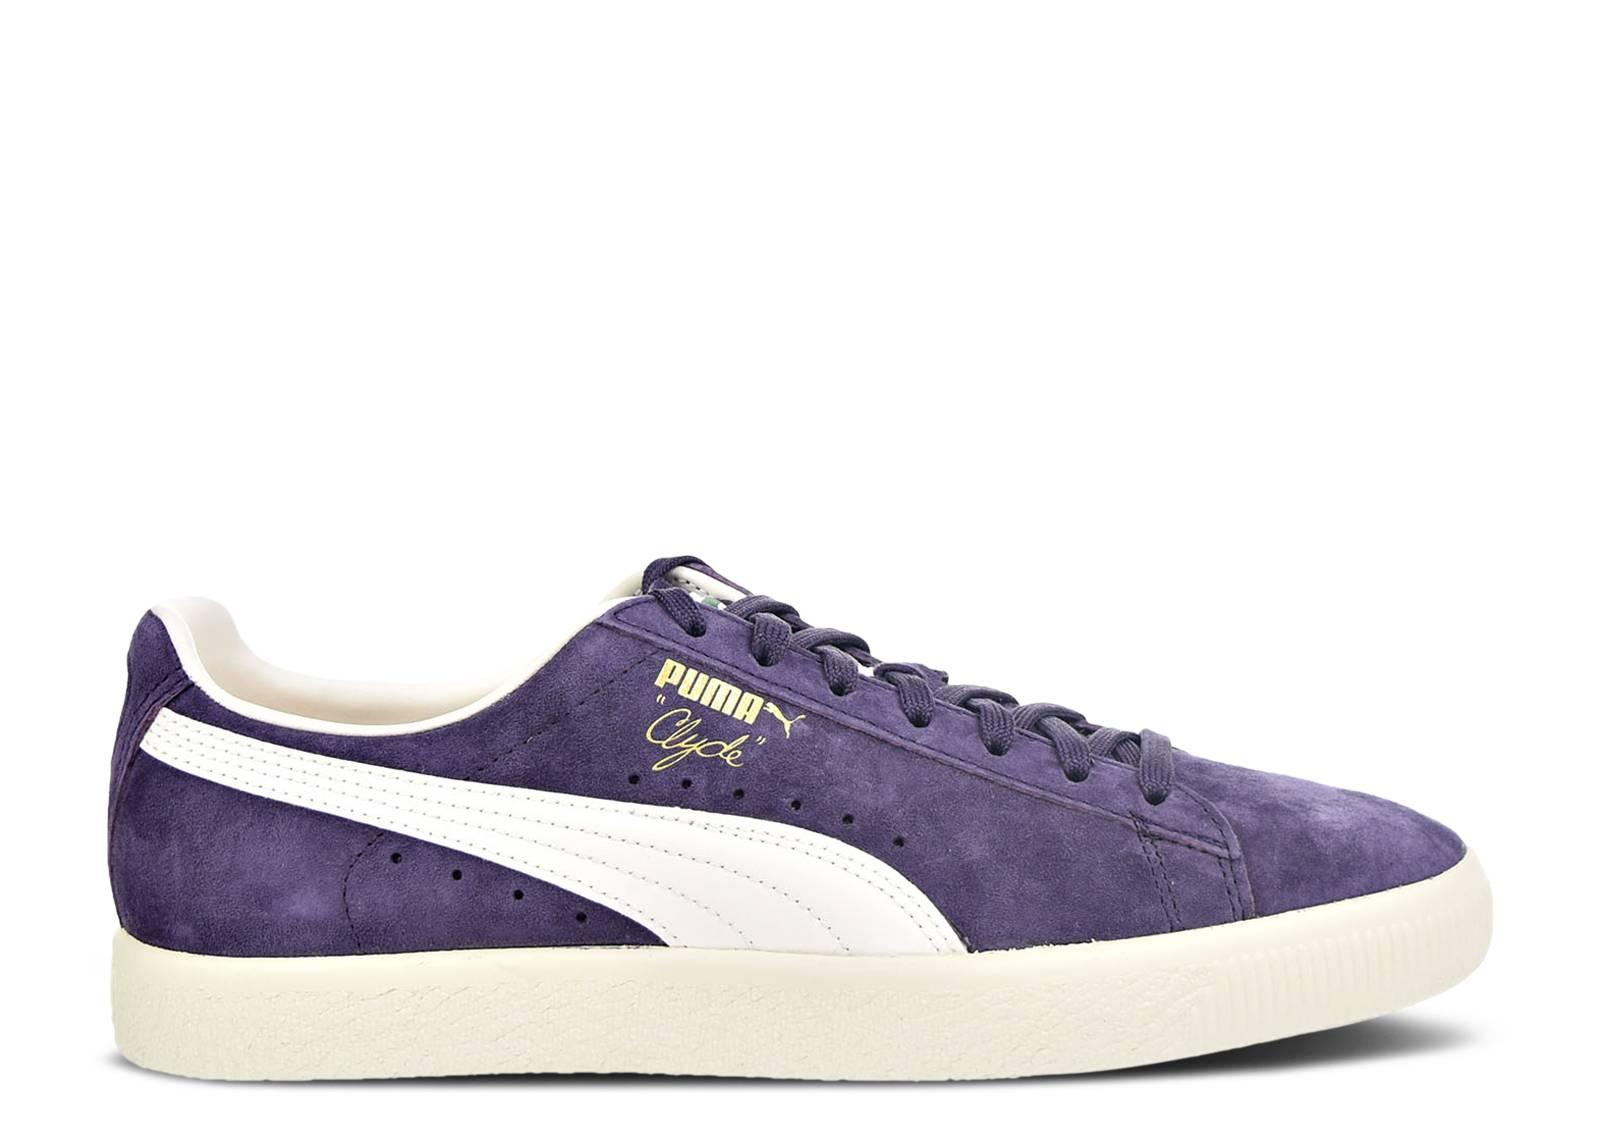 online store a7450 70bf3 Puma Sneakers - Rihanna Fenty, Creepers, Slides | Flight Club